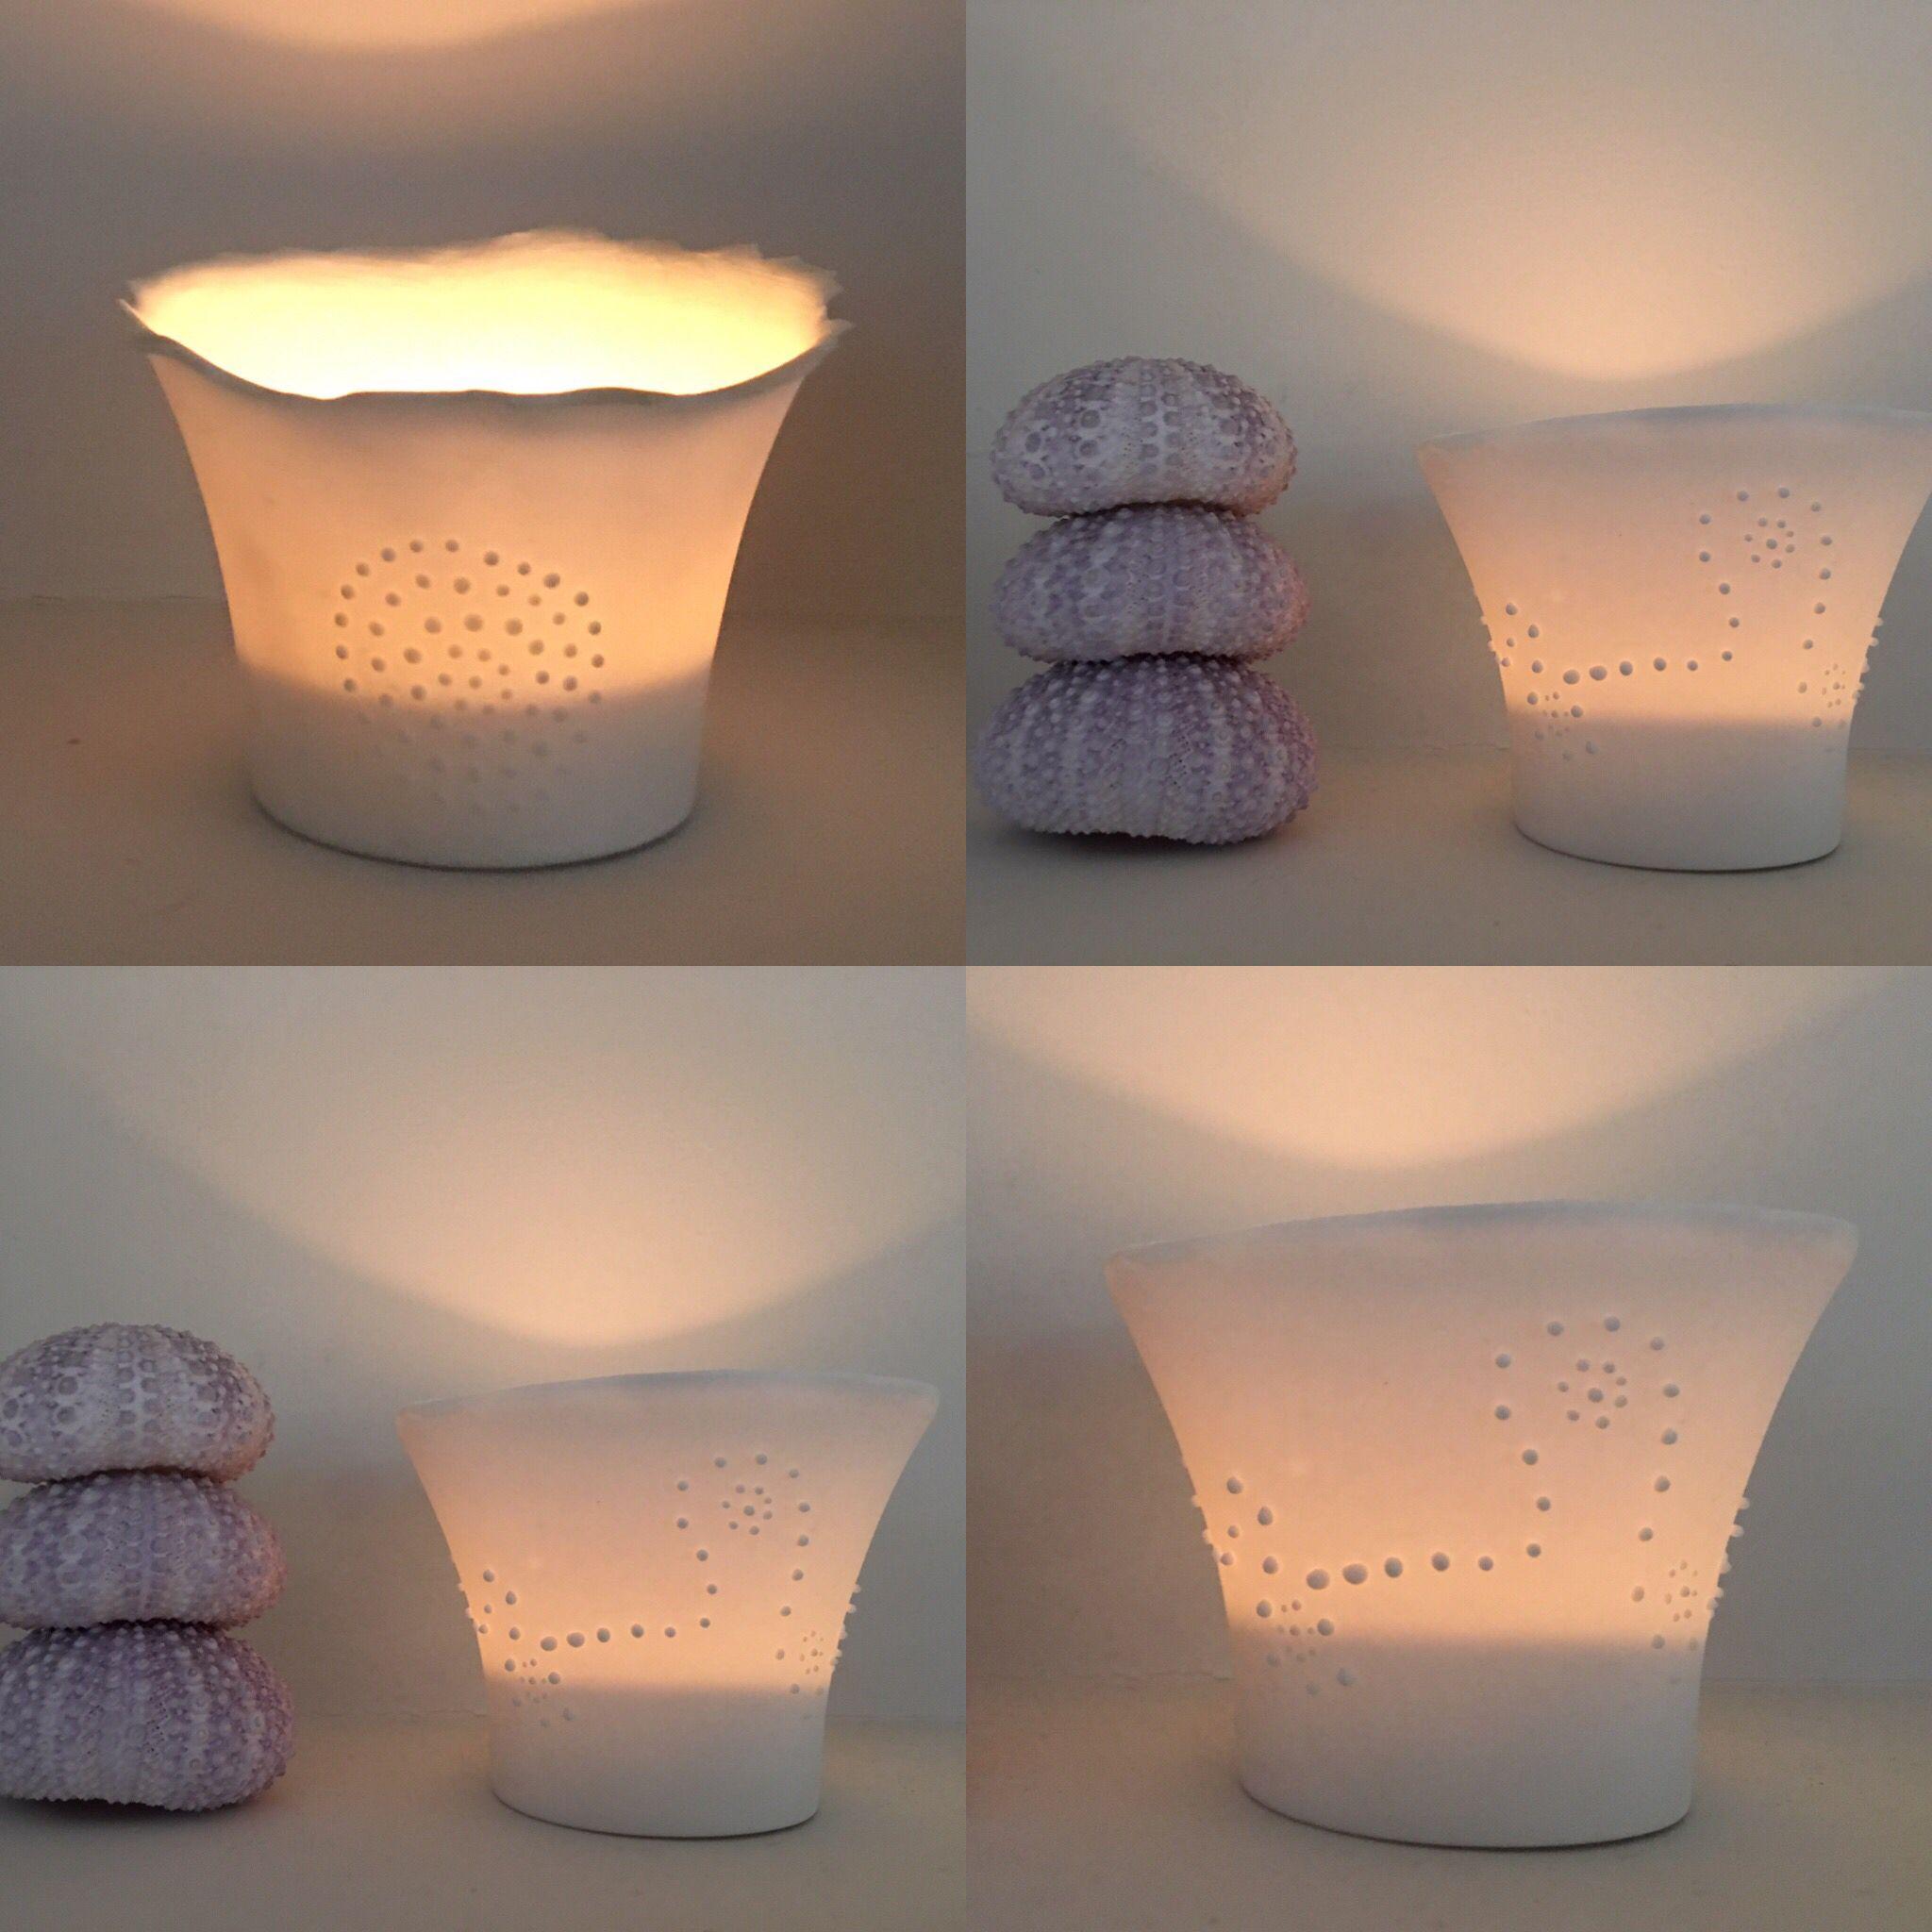 Bone china translucent tealights. So thin, so pure! Magic!